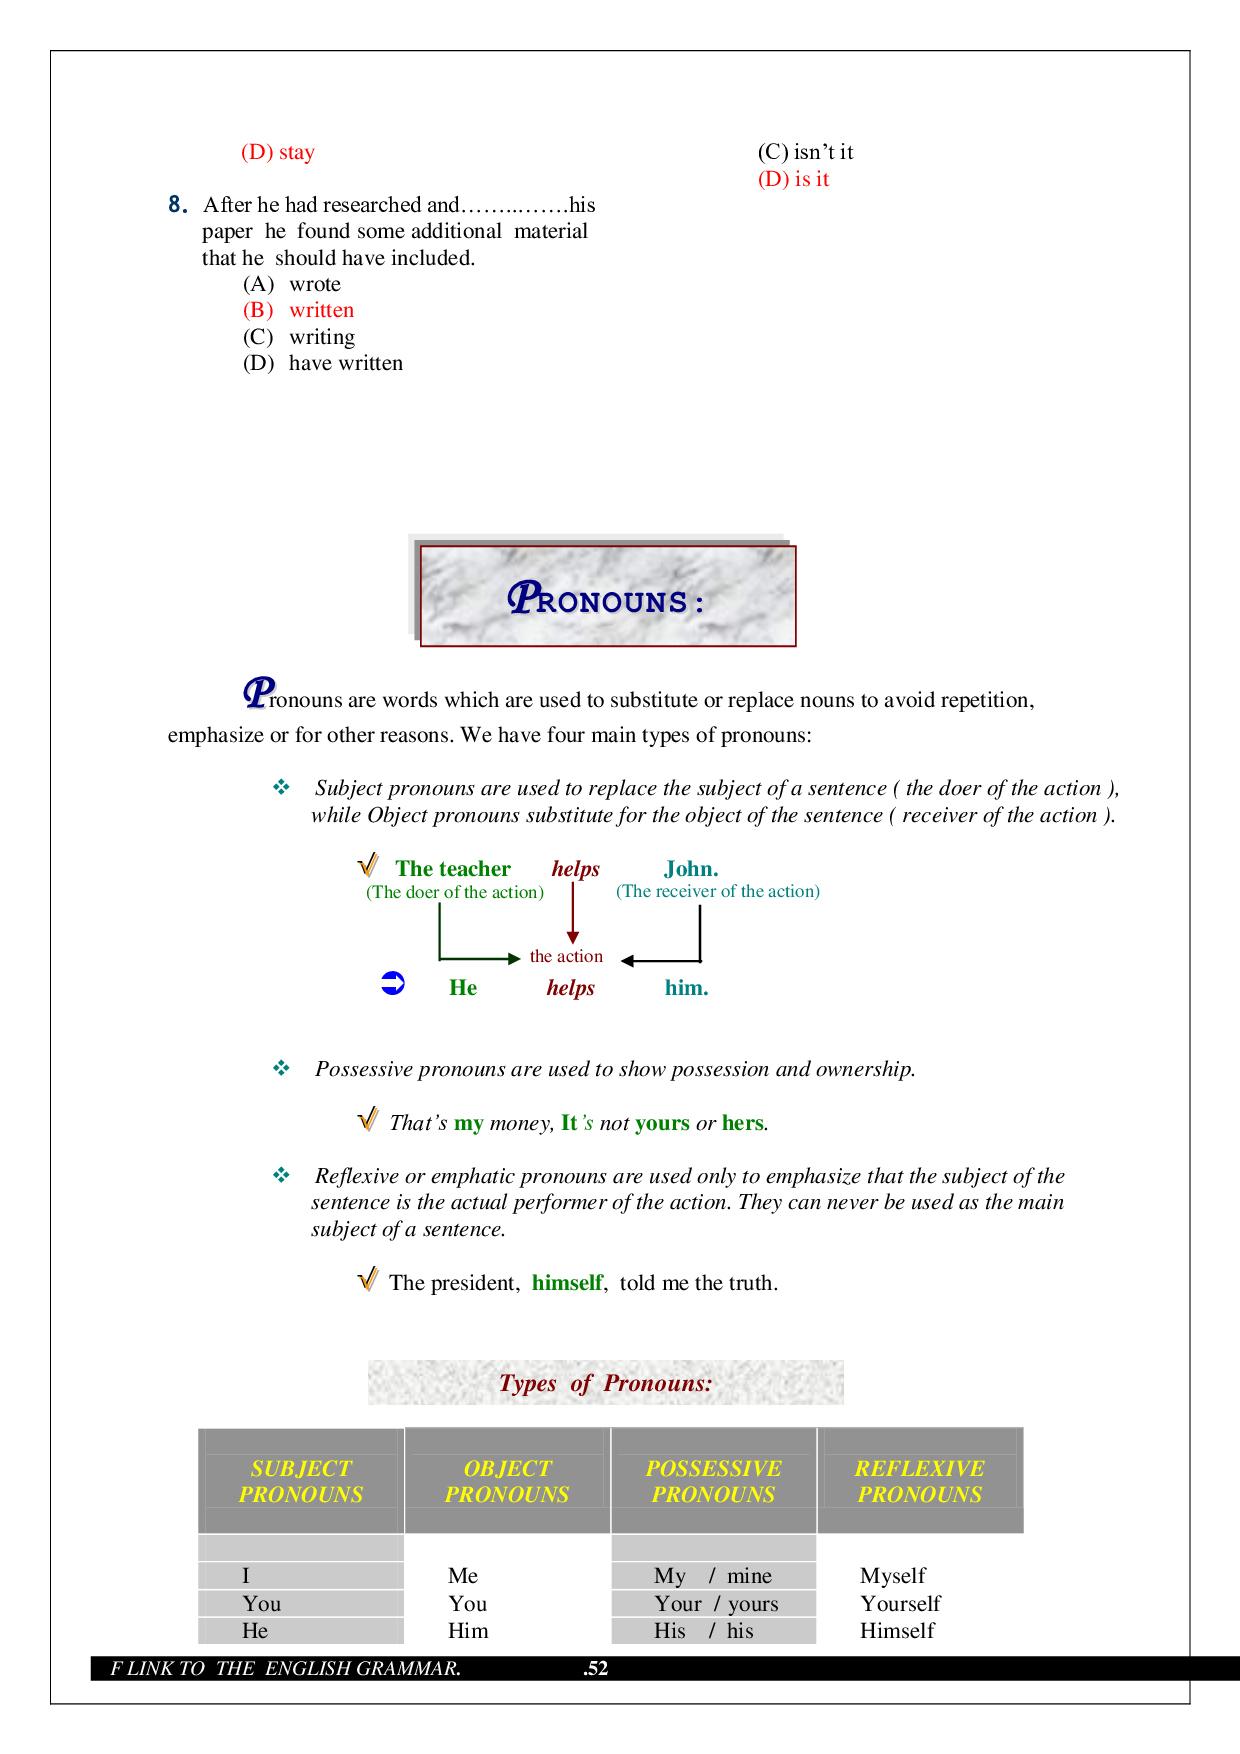 Grammar - Advanced